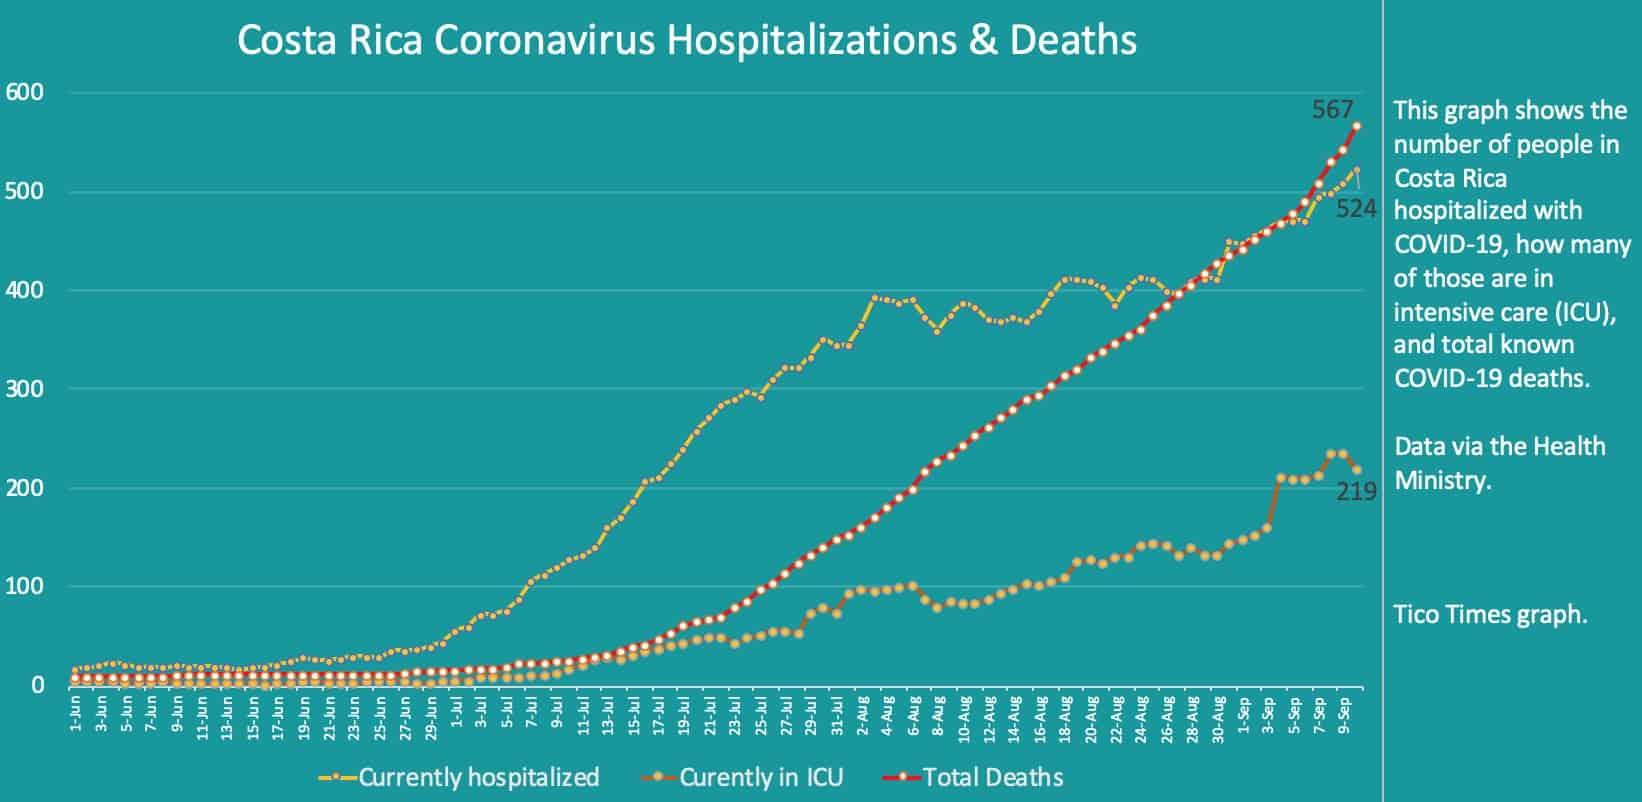 Costa Rica coronavirus hospitalizations and deaths on September 10, 2020